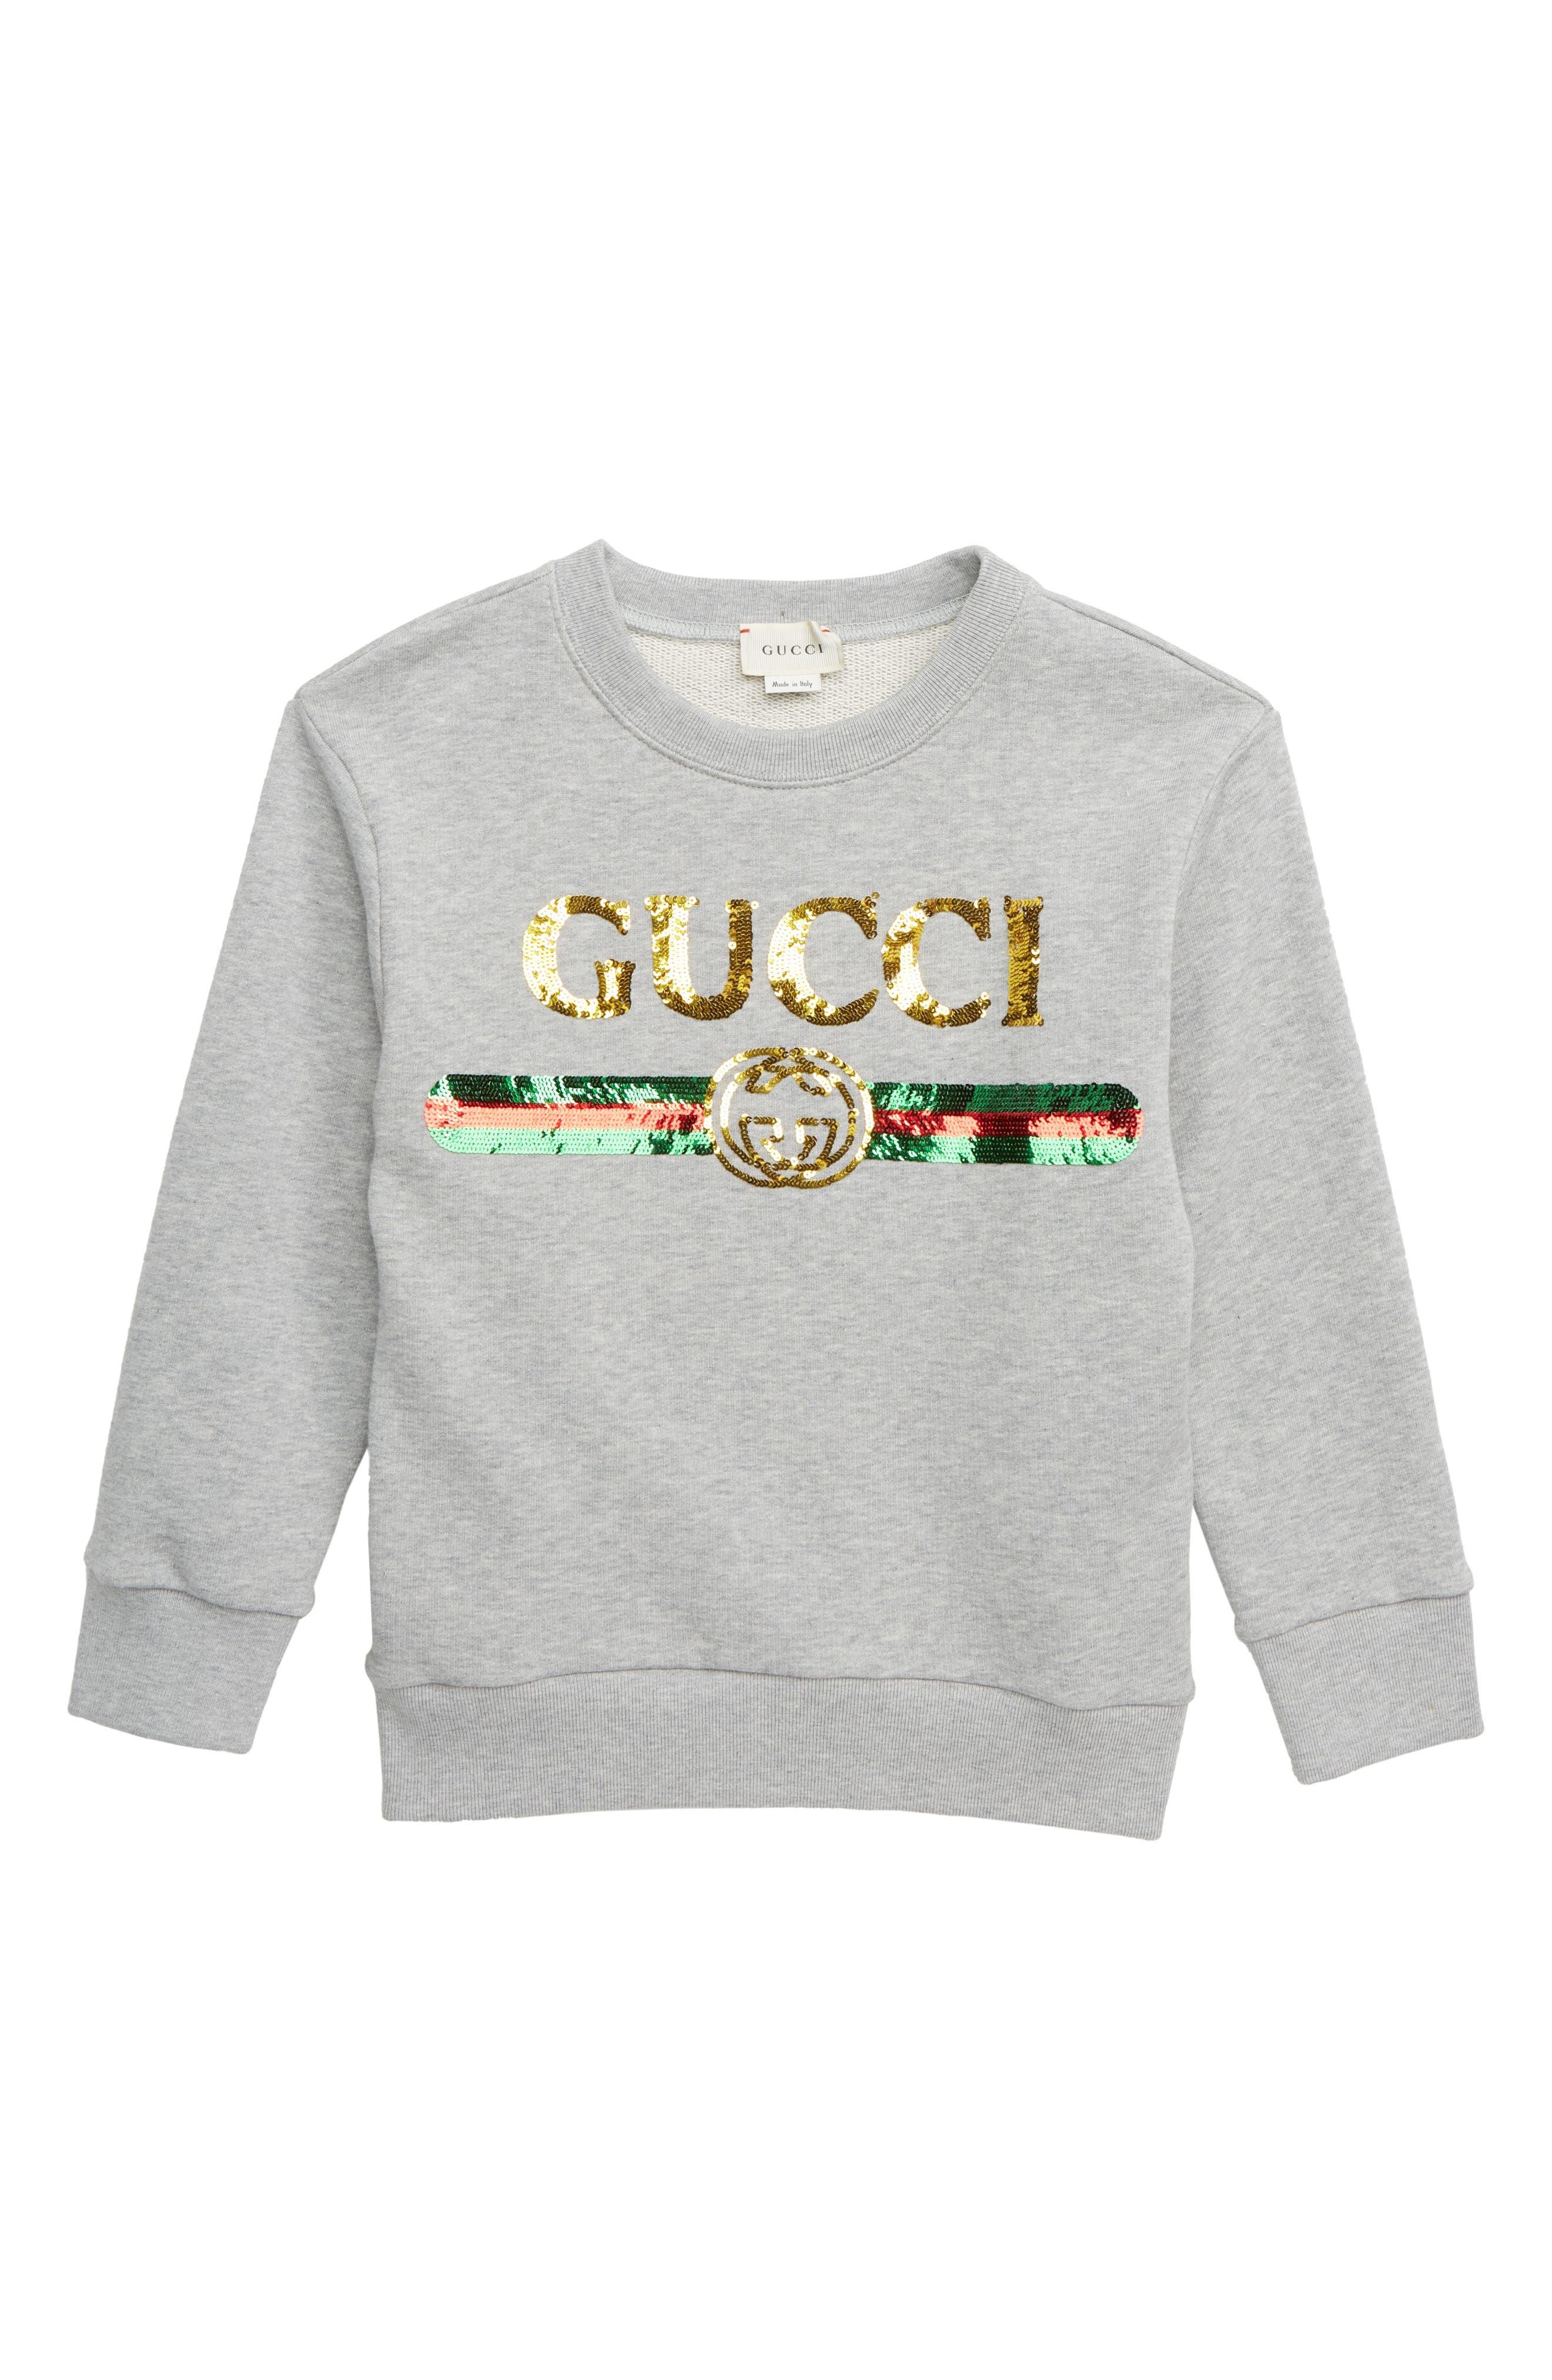 GUCCI,                             Embellished Sweatshirt,                             Main thumbnail 1, color,                             LIGHT GREY MELANGE